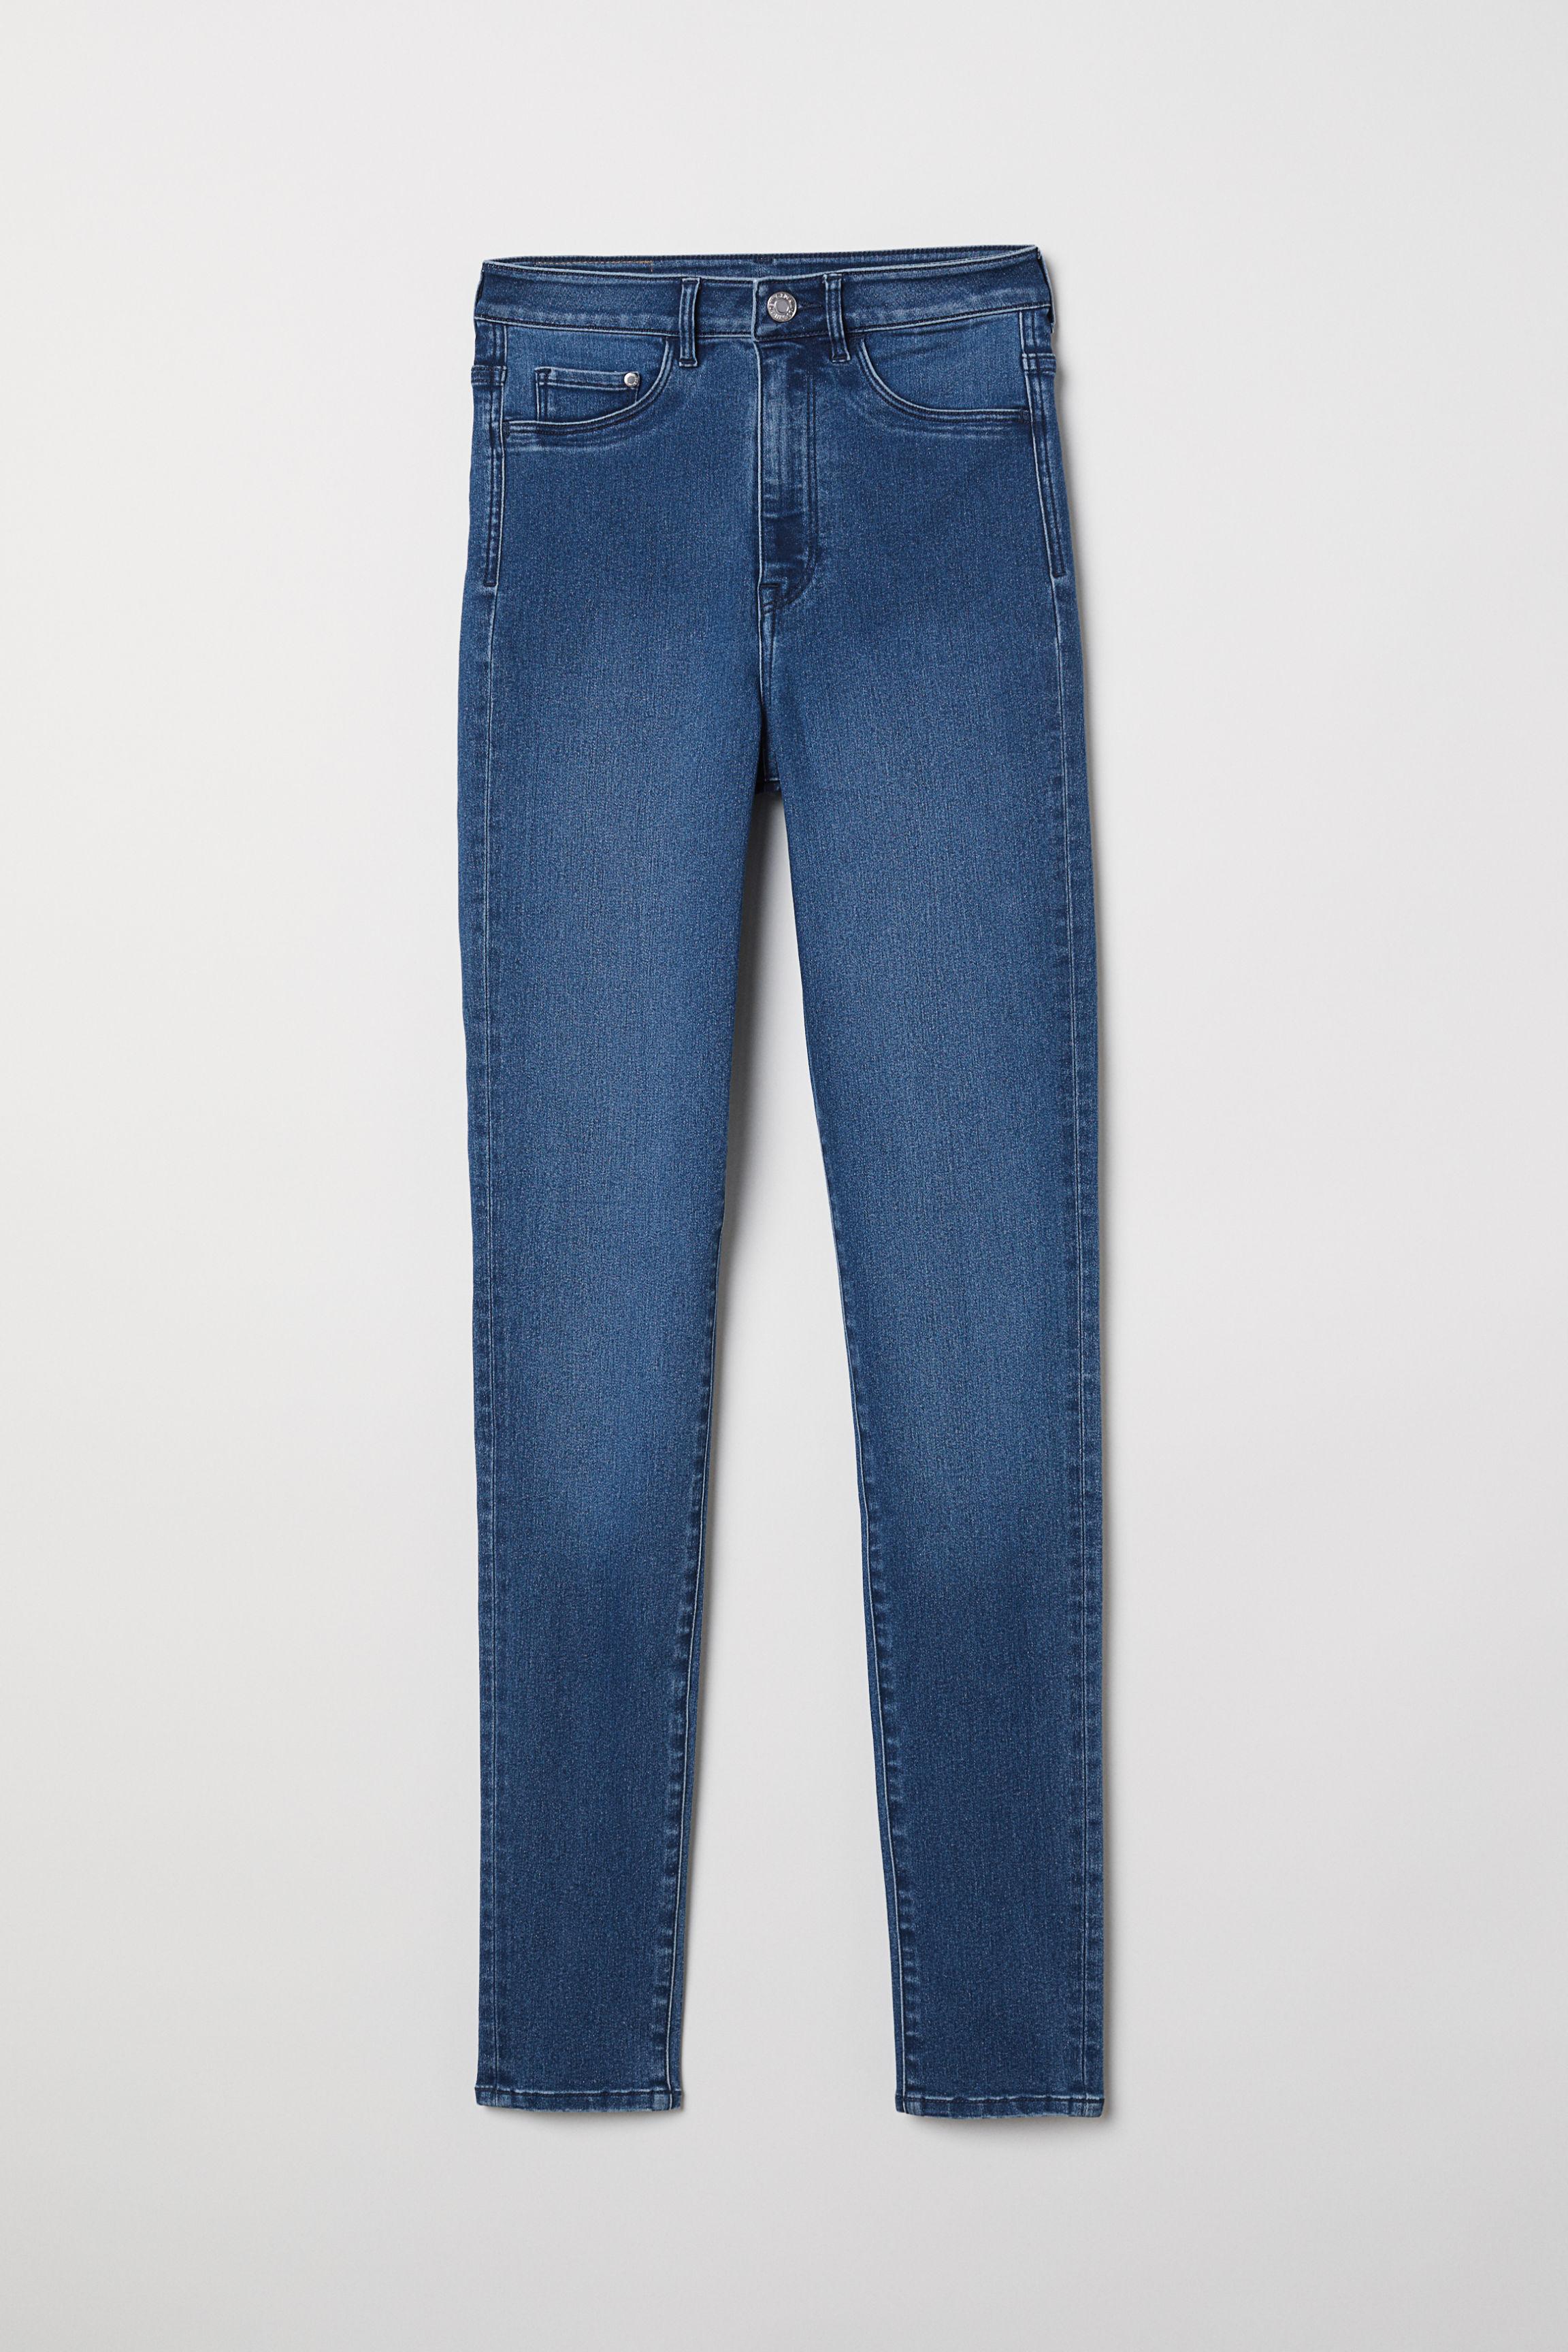 91fd3cc82106c Super Skinny High Jeggings - Denim blue - Ladies | H&M US